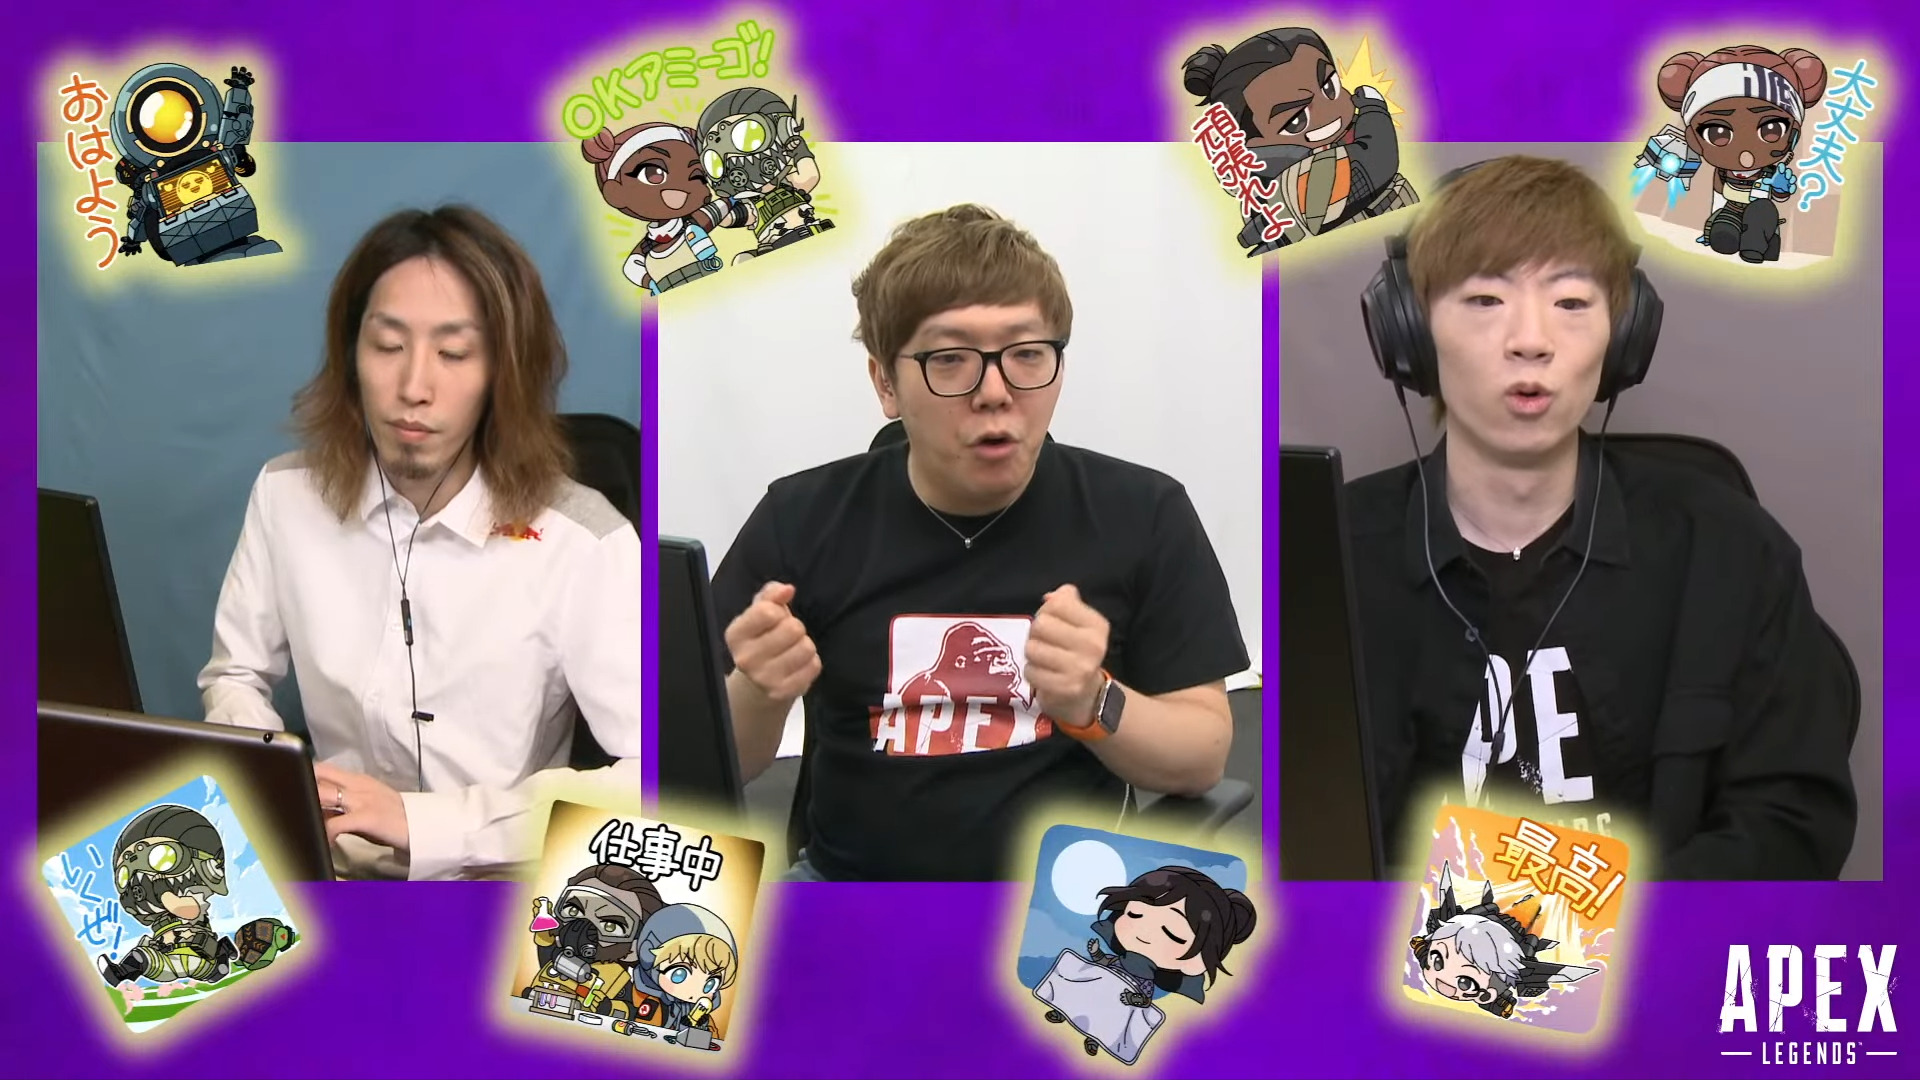 【APEX】新シーズンでSHAKA、ヒカキン、セイキン大暴れ生配信!【英雄の軌跡】 2-6-10 screenshot